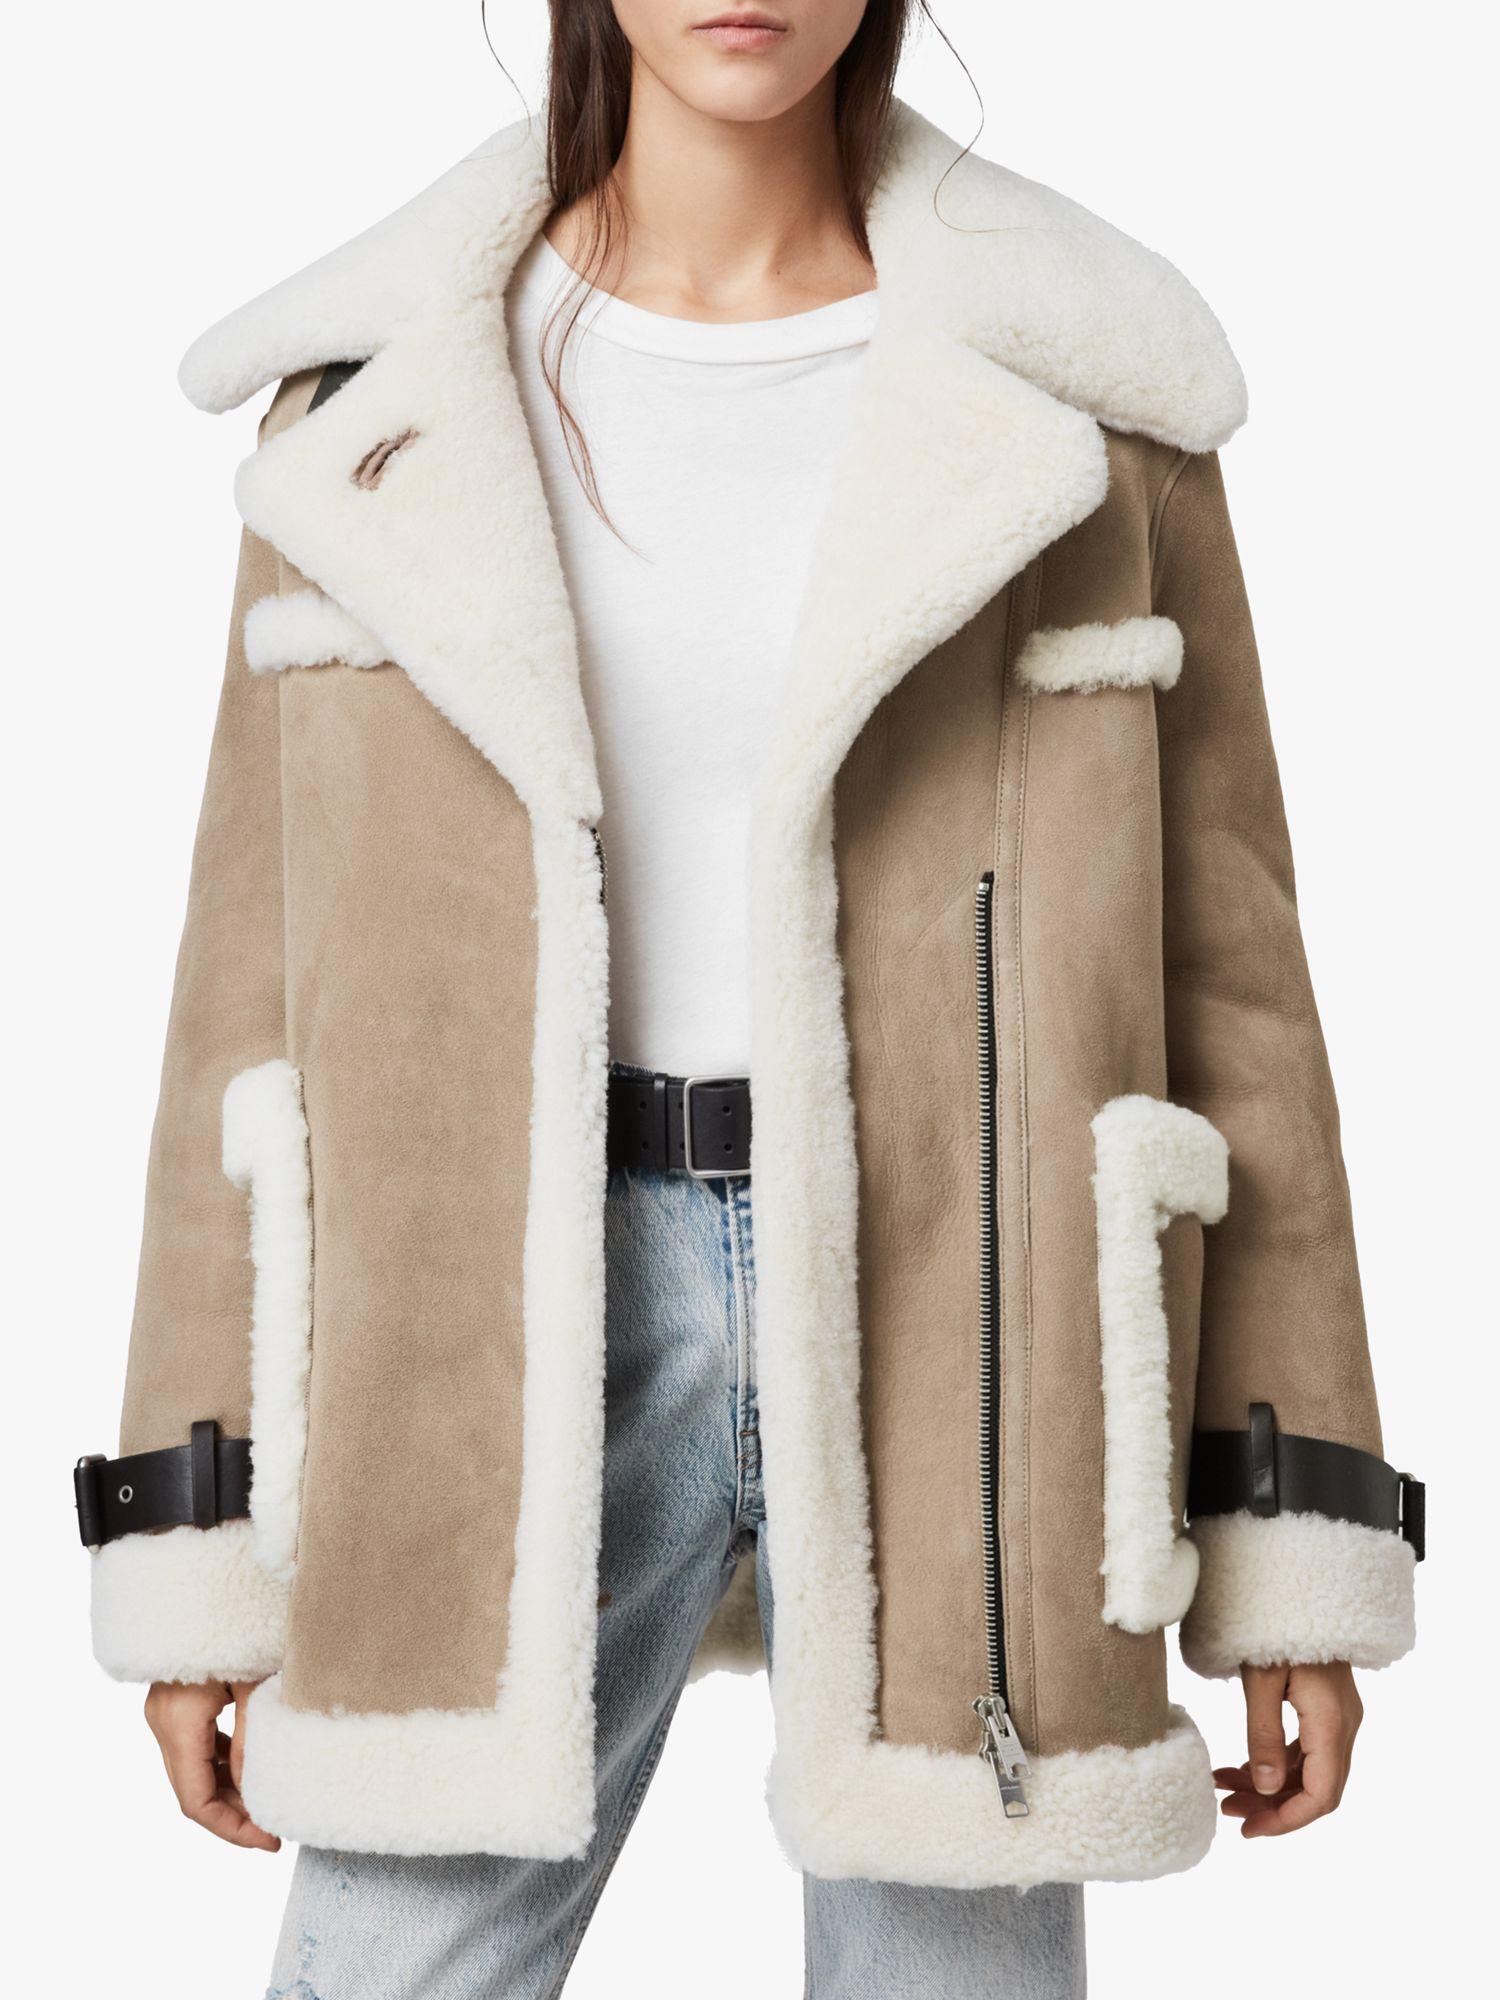 AllSaints Bronx Aviator Shearling Coat, TaupeChalk White at